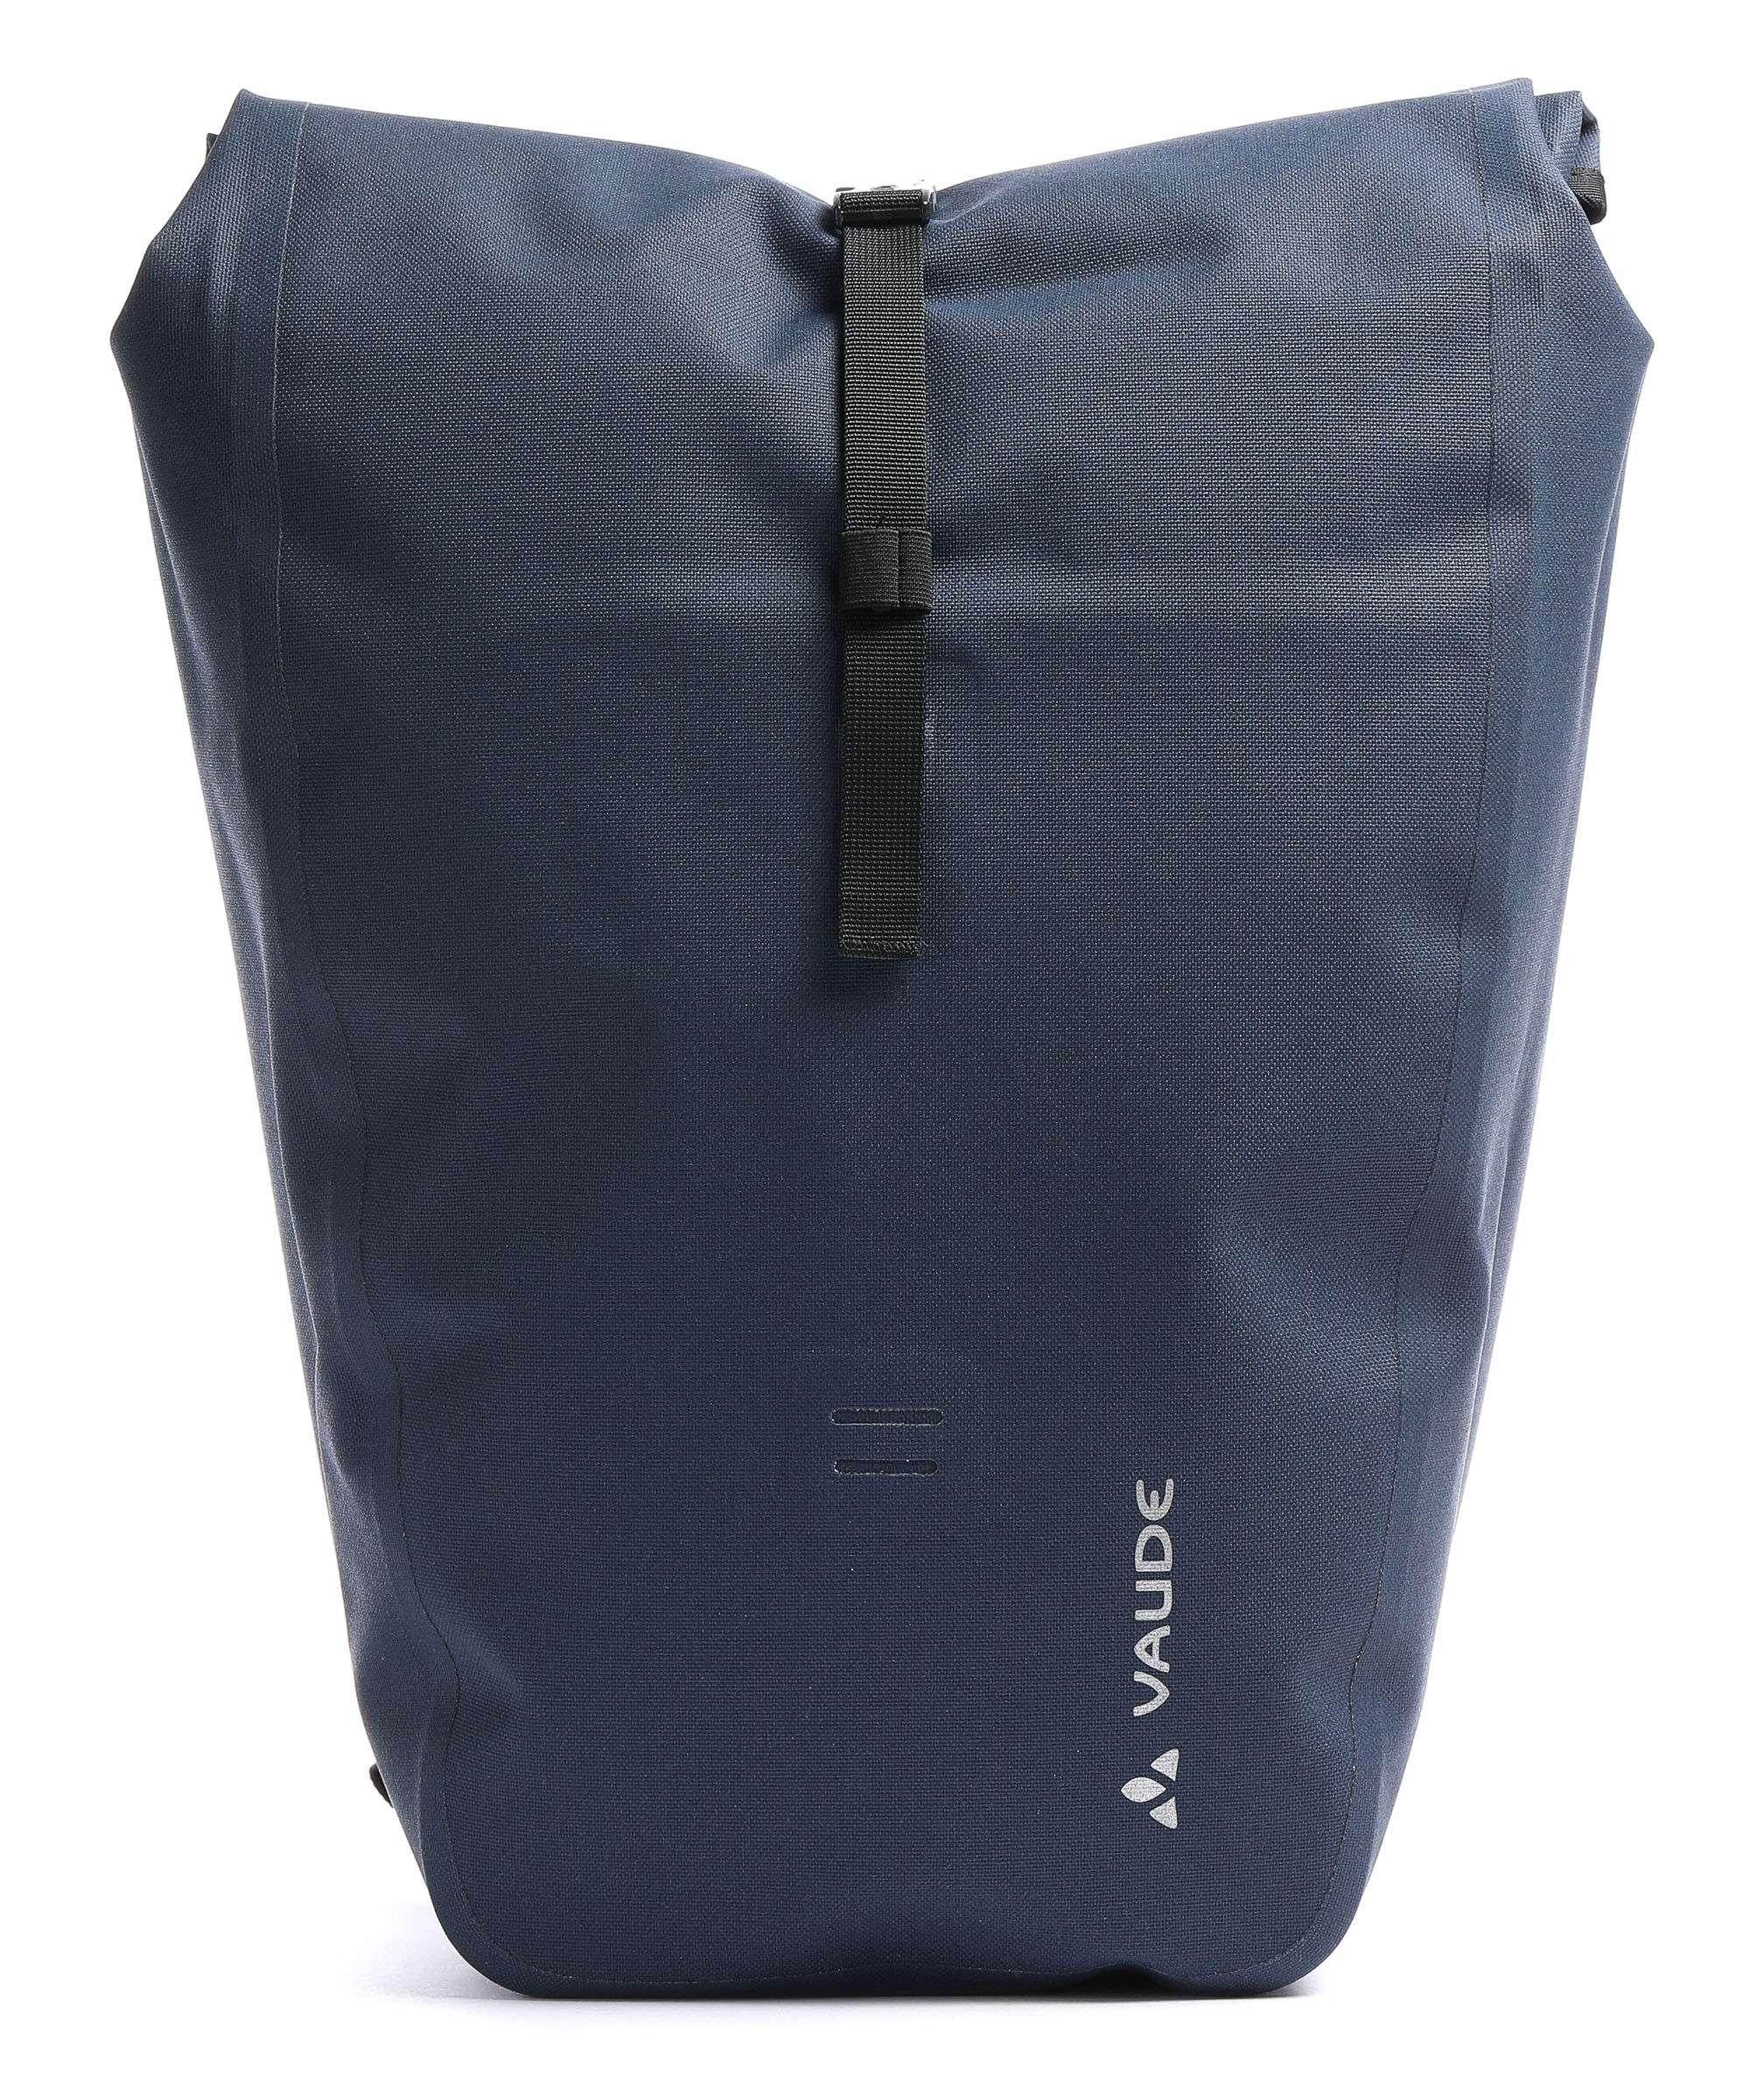 VAUDE Isny II Rolltop Rucksack Polyamide 20 l in blau (marine)